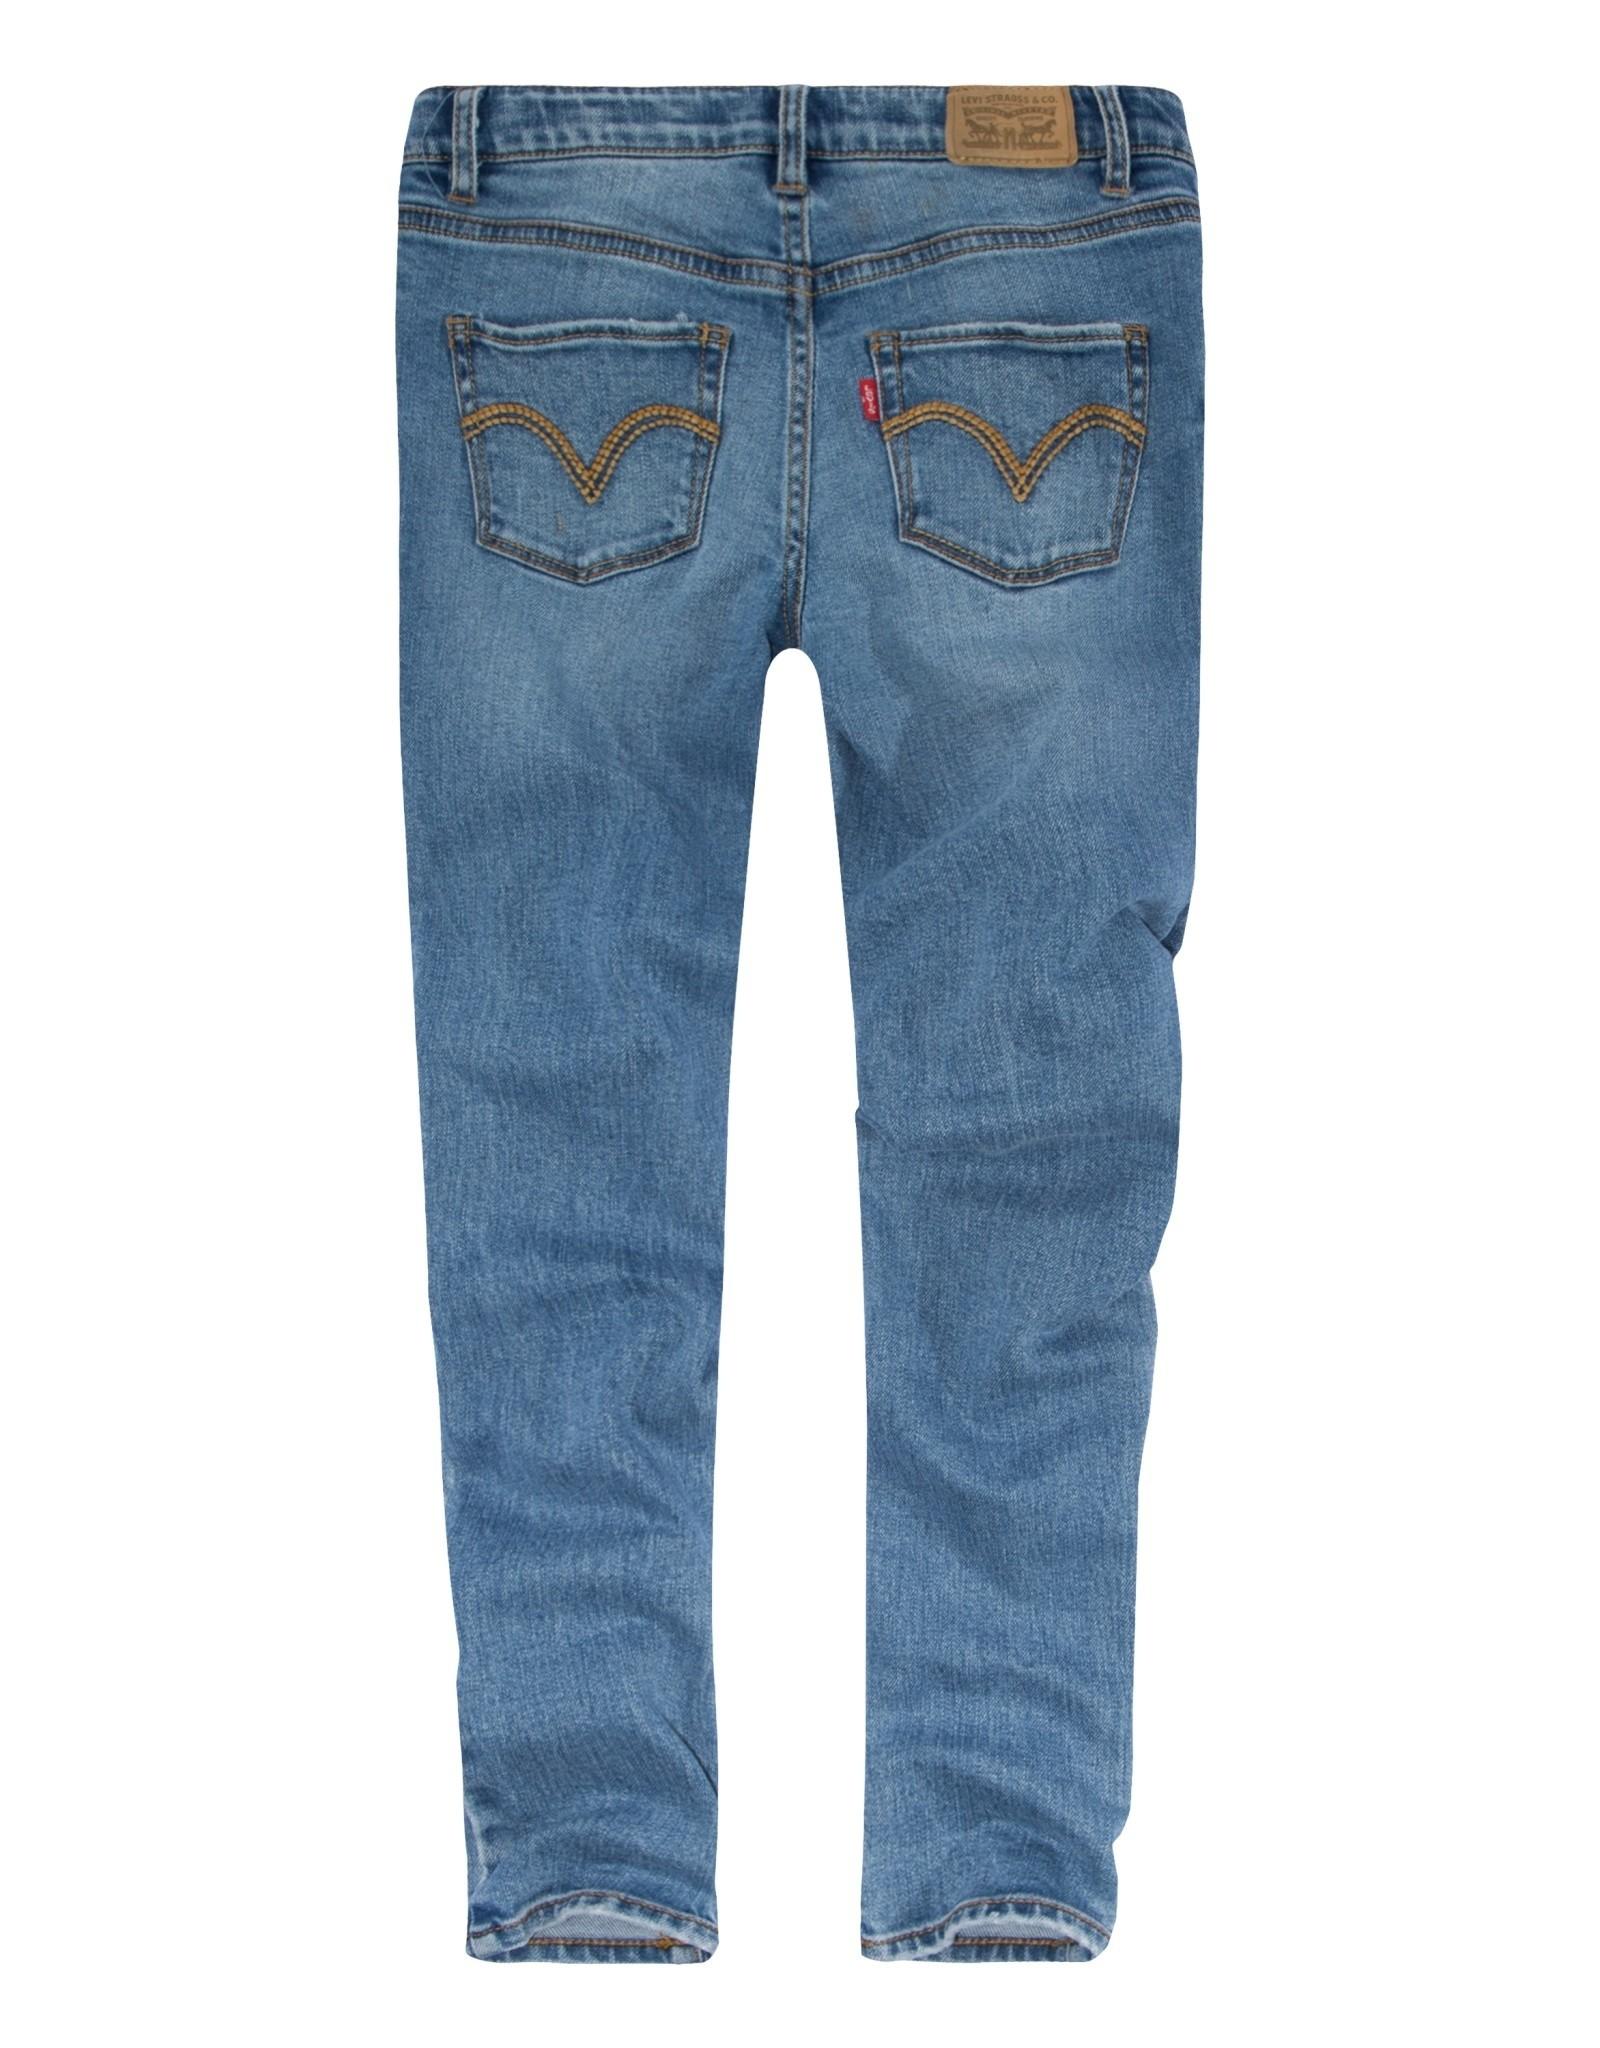 LEVI'S LEVI'S lvg 710 super skinny jean palisades